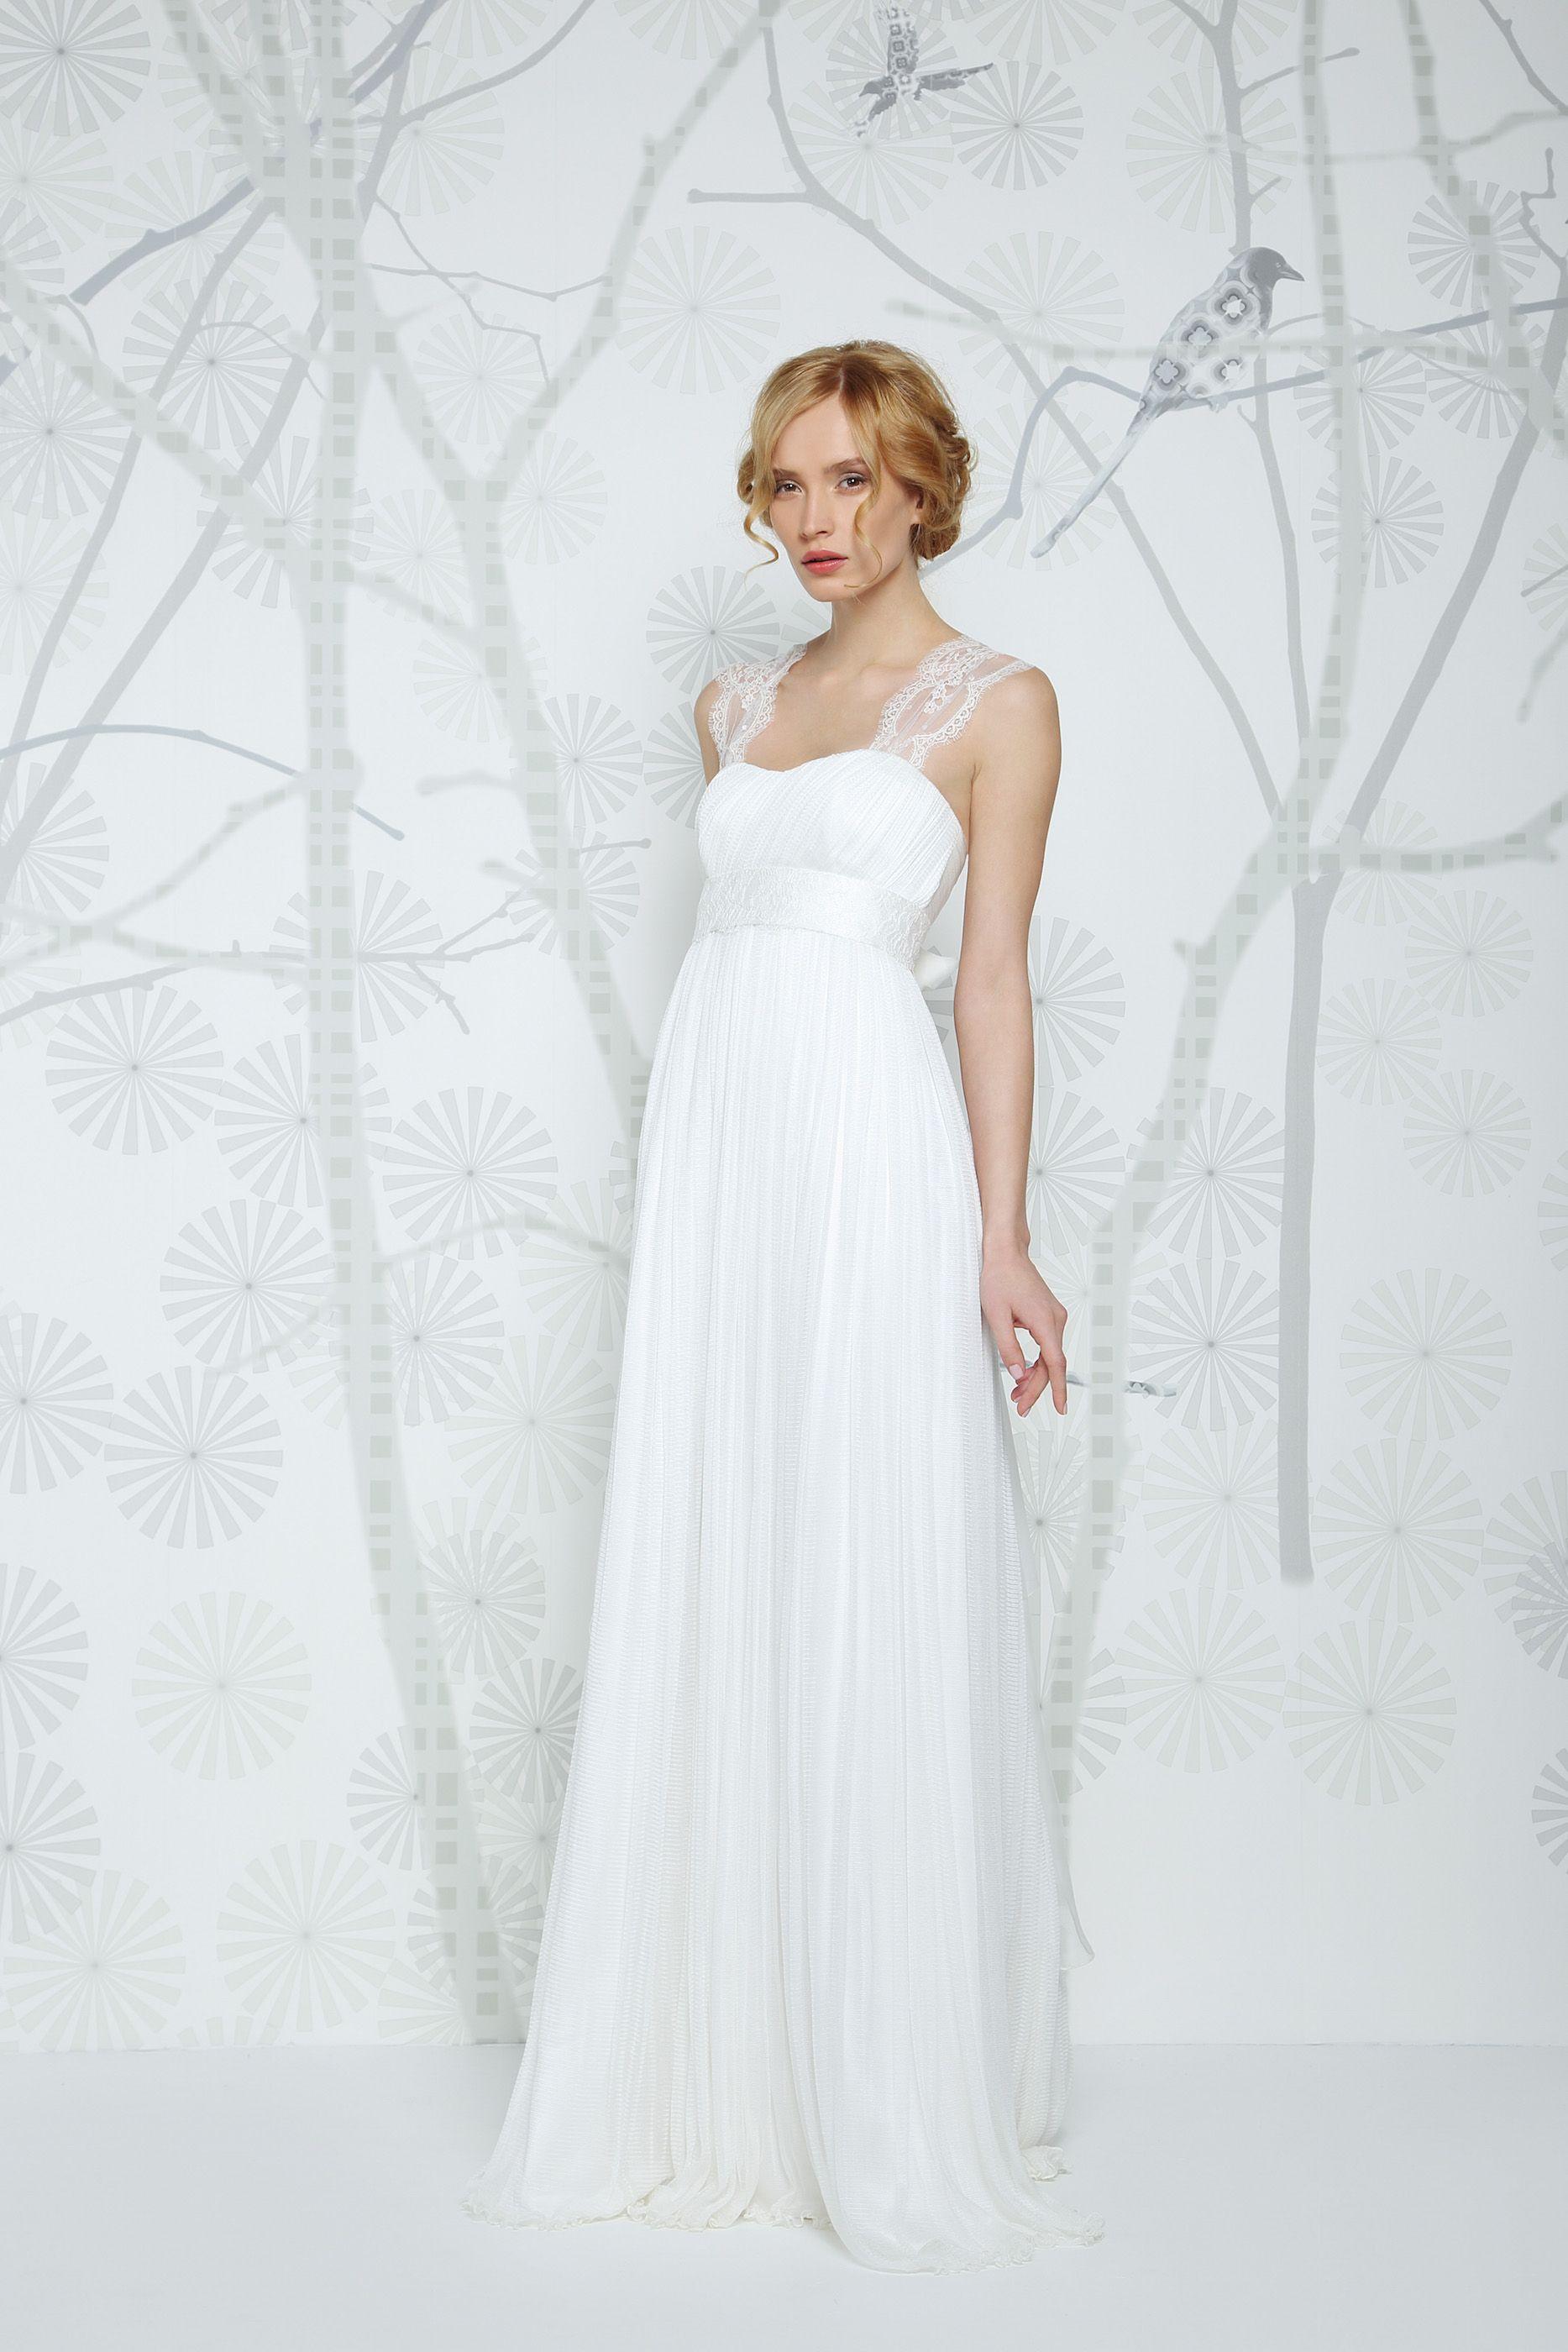 Sadoni Brautkleid | Beautiful Wedding Gowns For Older Women ...